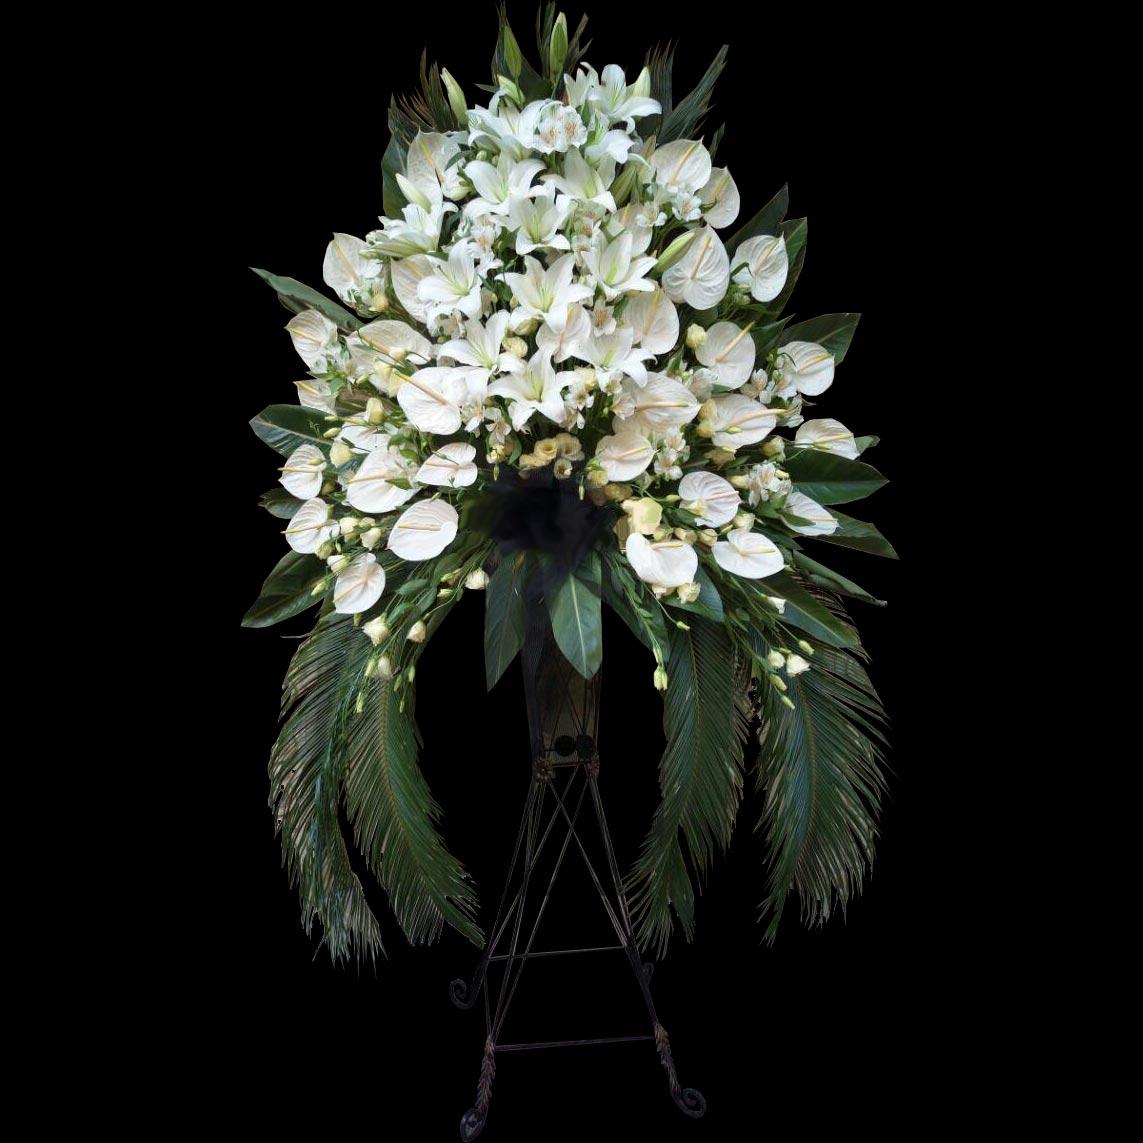 تاج گل فانتری آنتریوم لیلیوم پایه فرفورژه